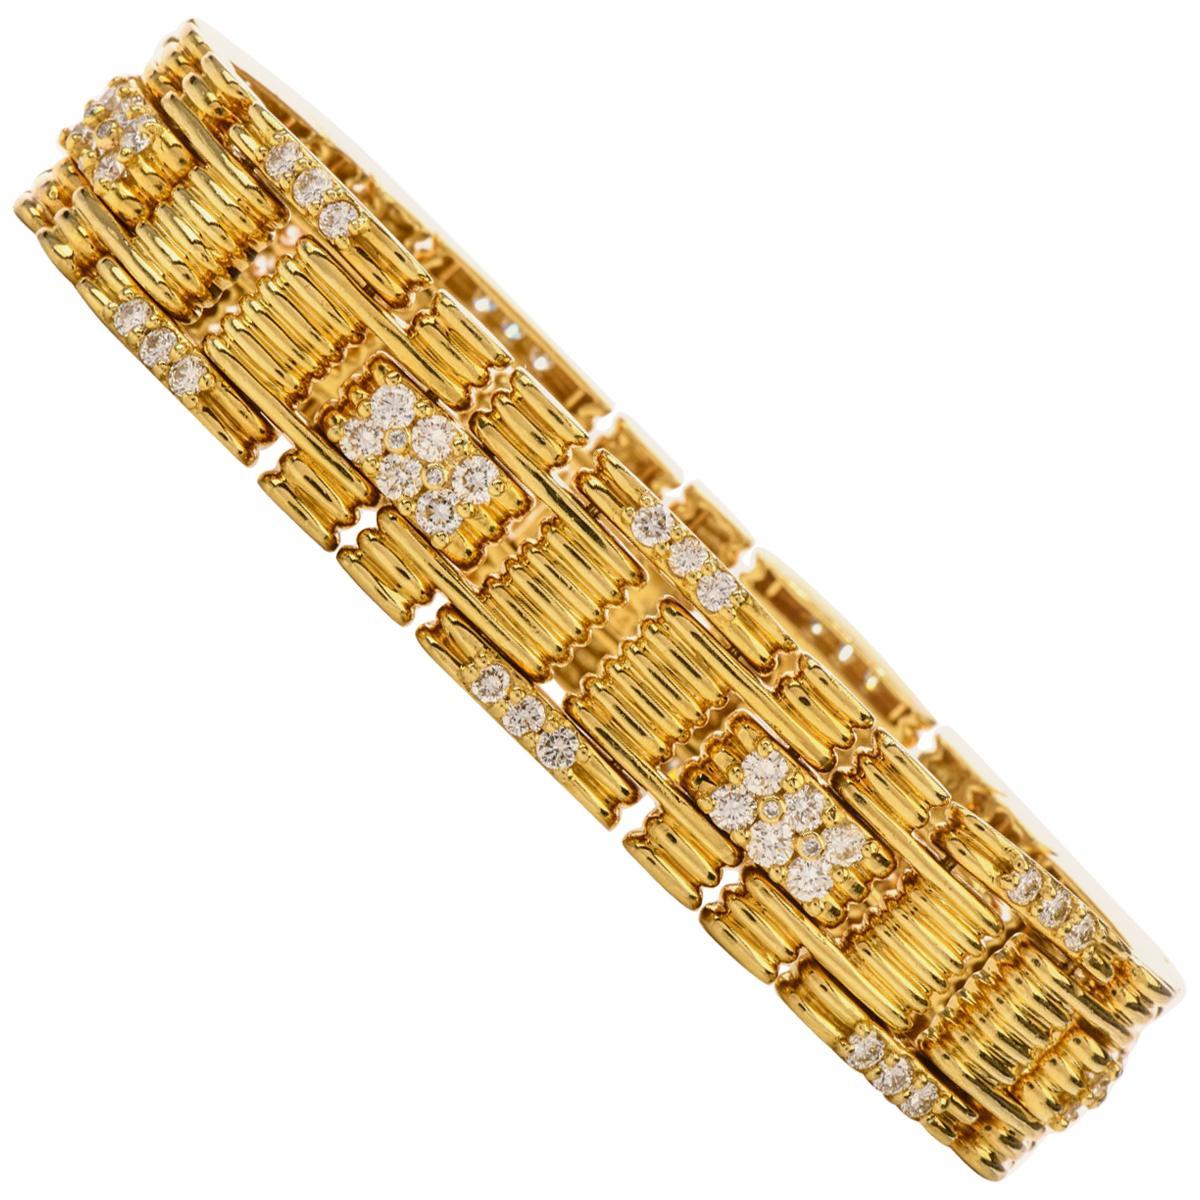 Jose Hess 1980s Diamond Link 18 Karat Yellow Gold Bracelet